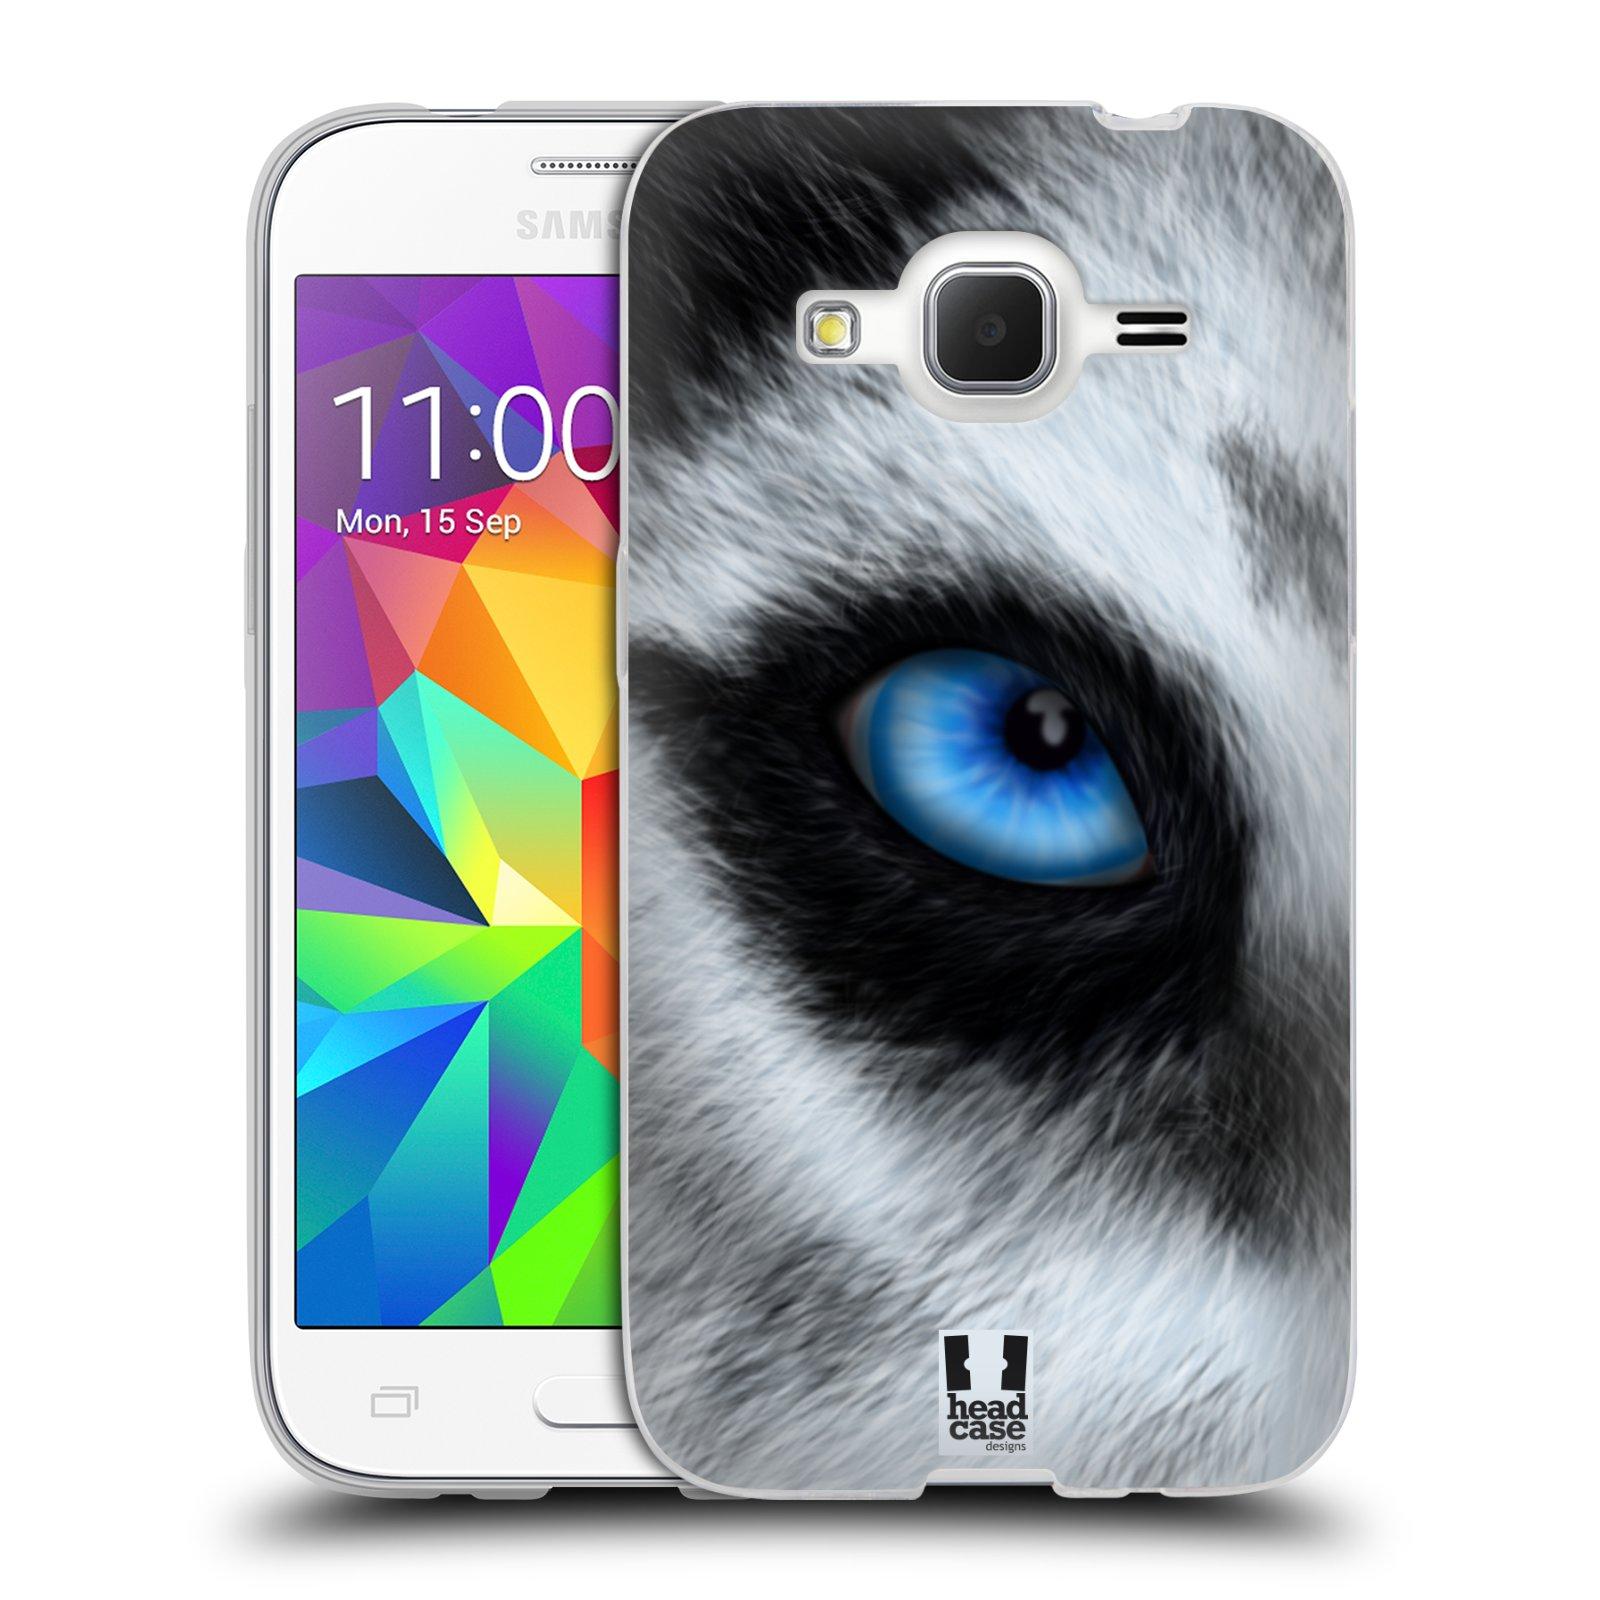 HEAD CASE silikonový obal na mobil Samsung Galaxy Core Prime (G360) vzor pohled zvířete oko pes husky